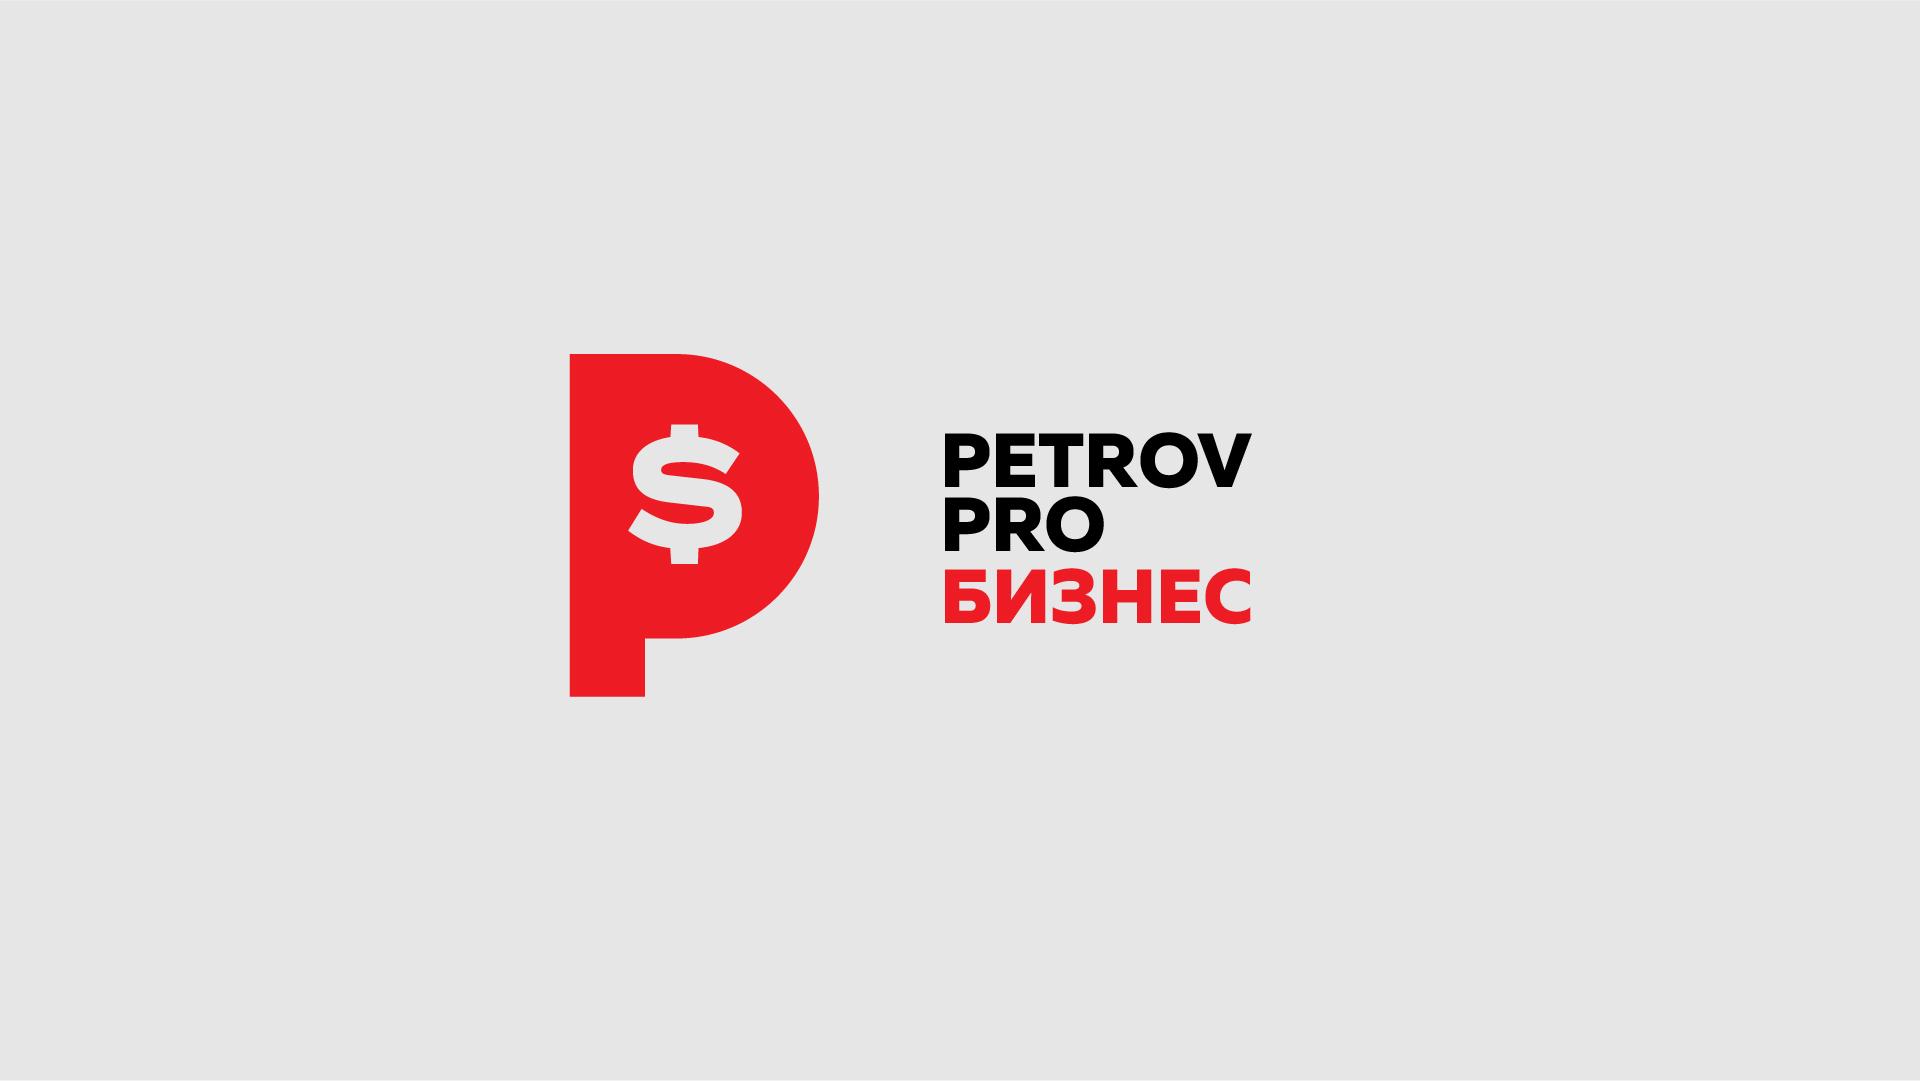 Создать логотип для YouTube канала  фото f_3365c0ab5ea901a2.jpg